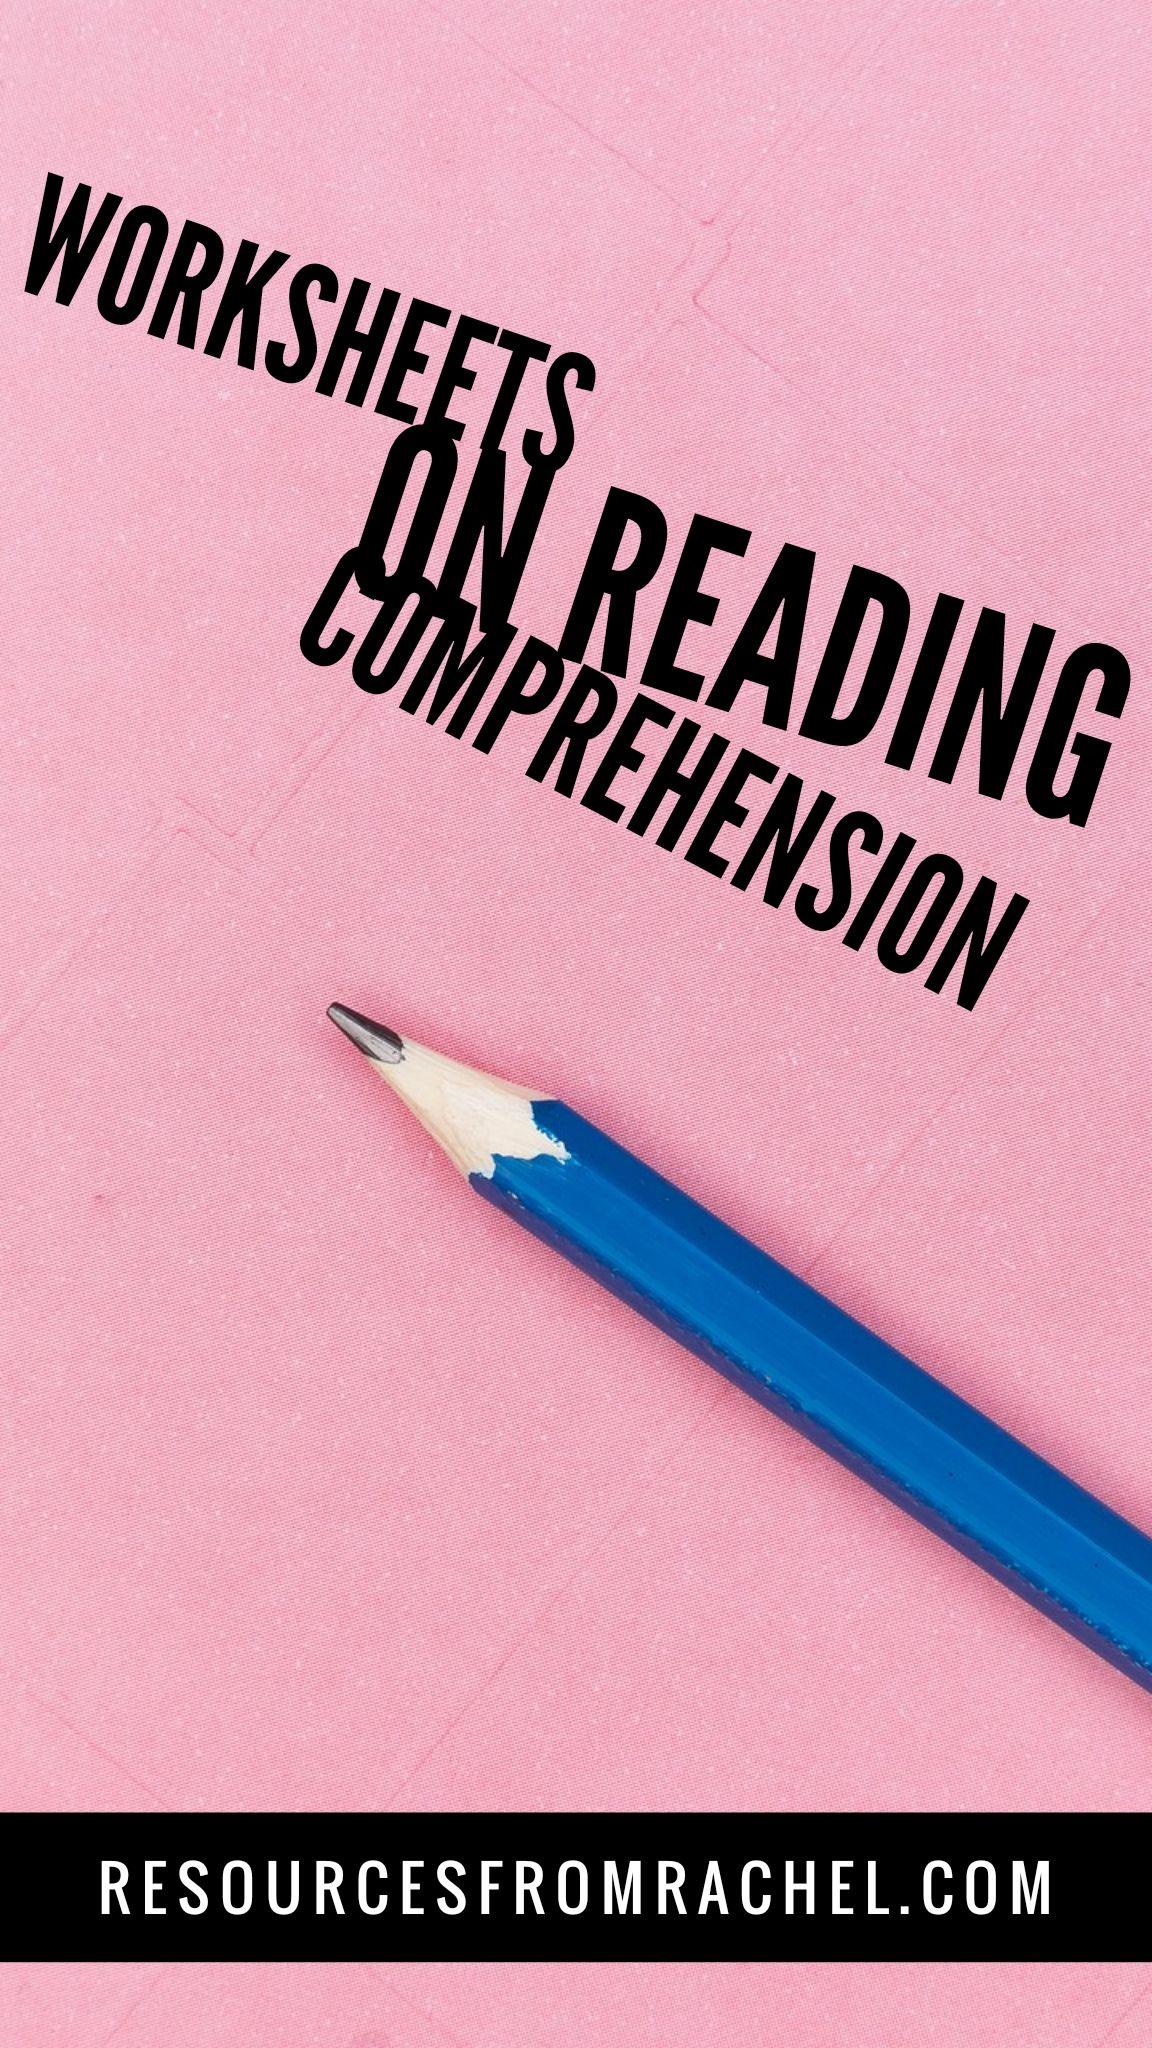 Worksheets On Reading Comprehension In